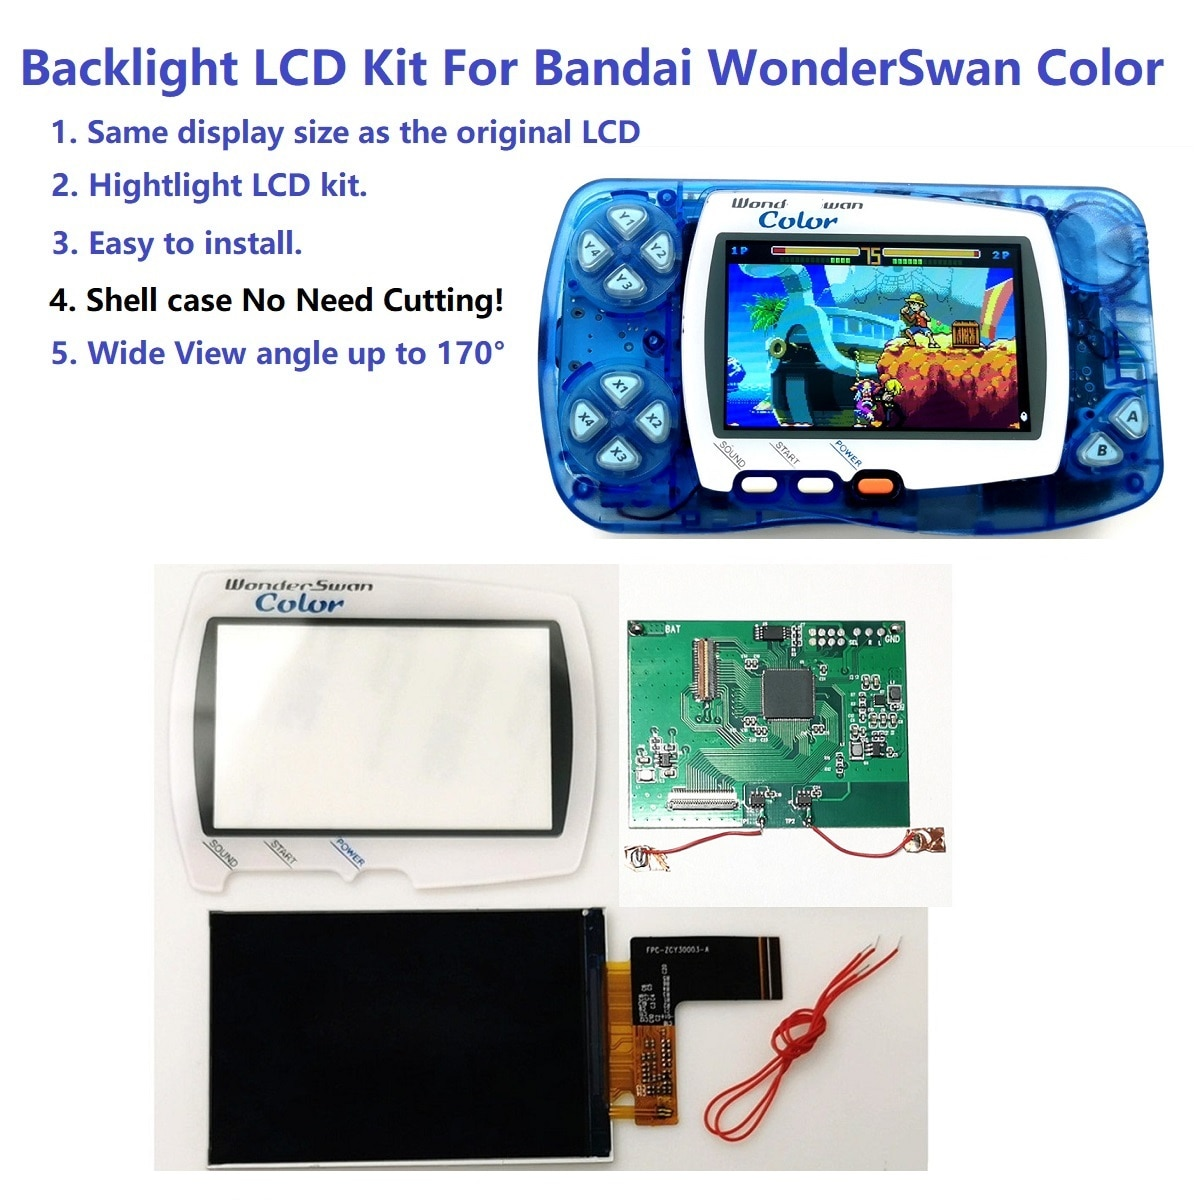 Hightlight 백라이트 밝기 IPS LCD 스크린 키트 반다이 WonderSwan 색상 WSC 게임 콘솔